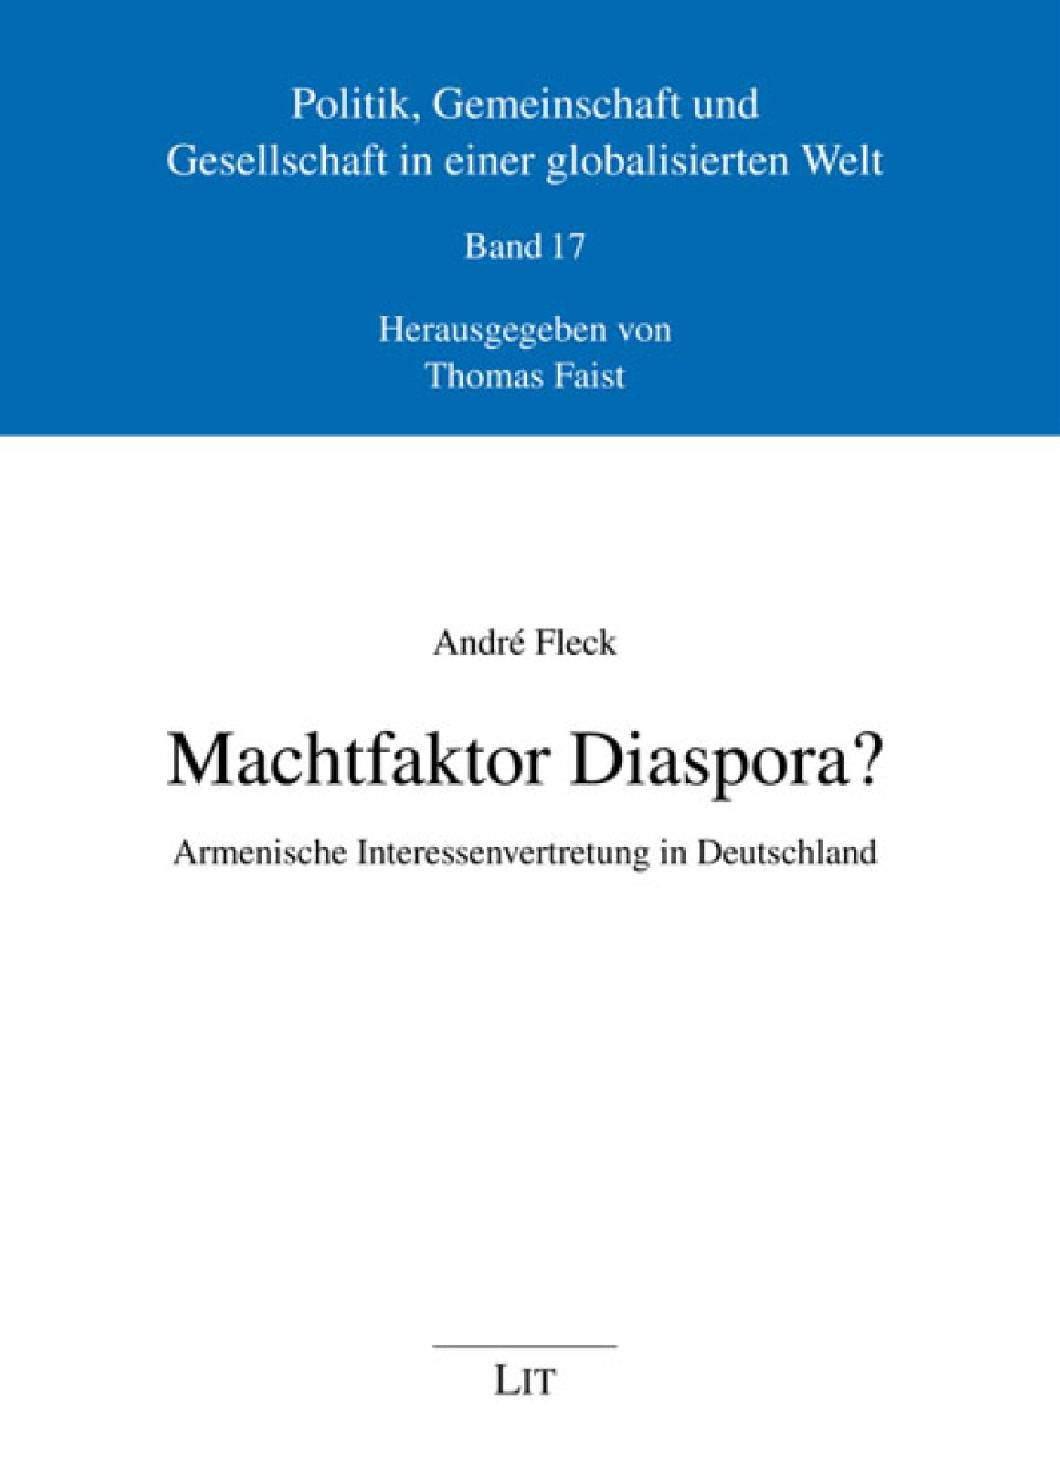 machtfactor diaspora